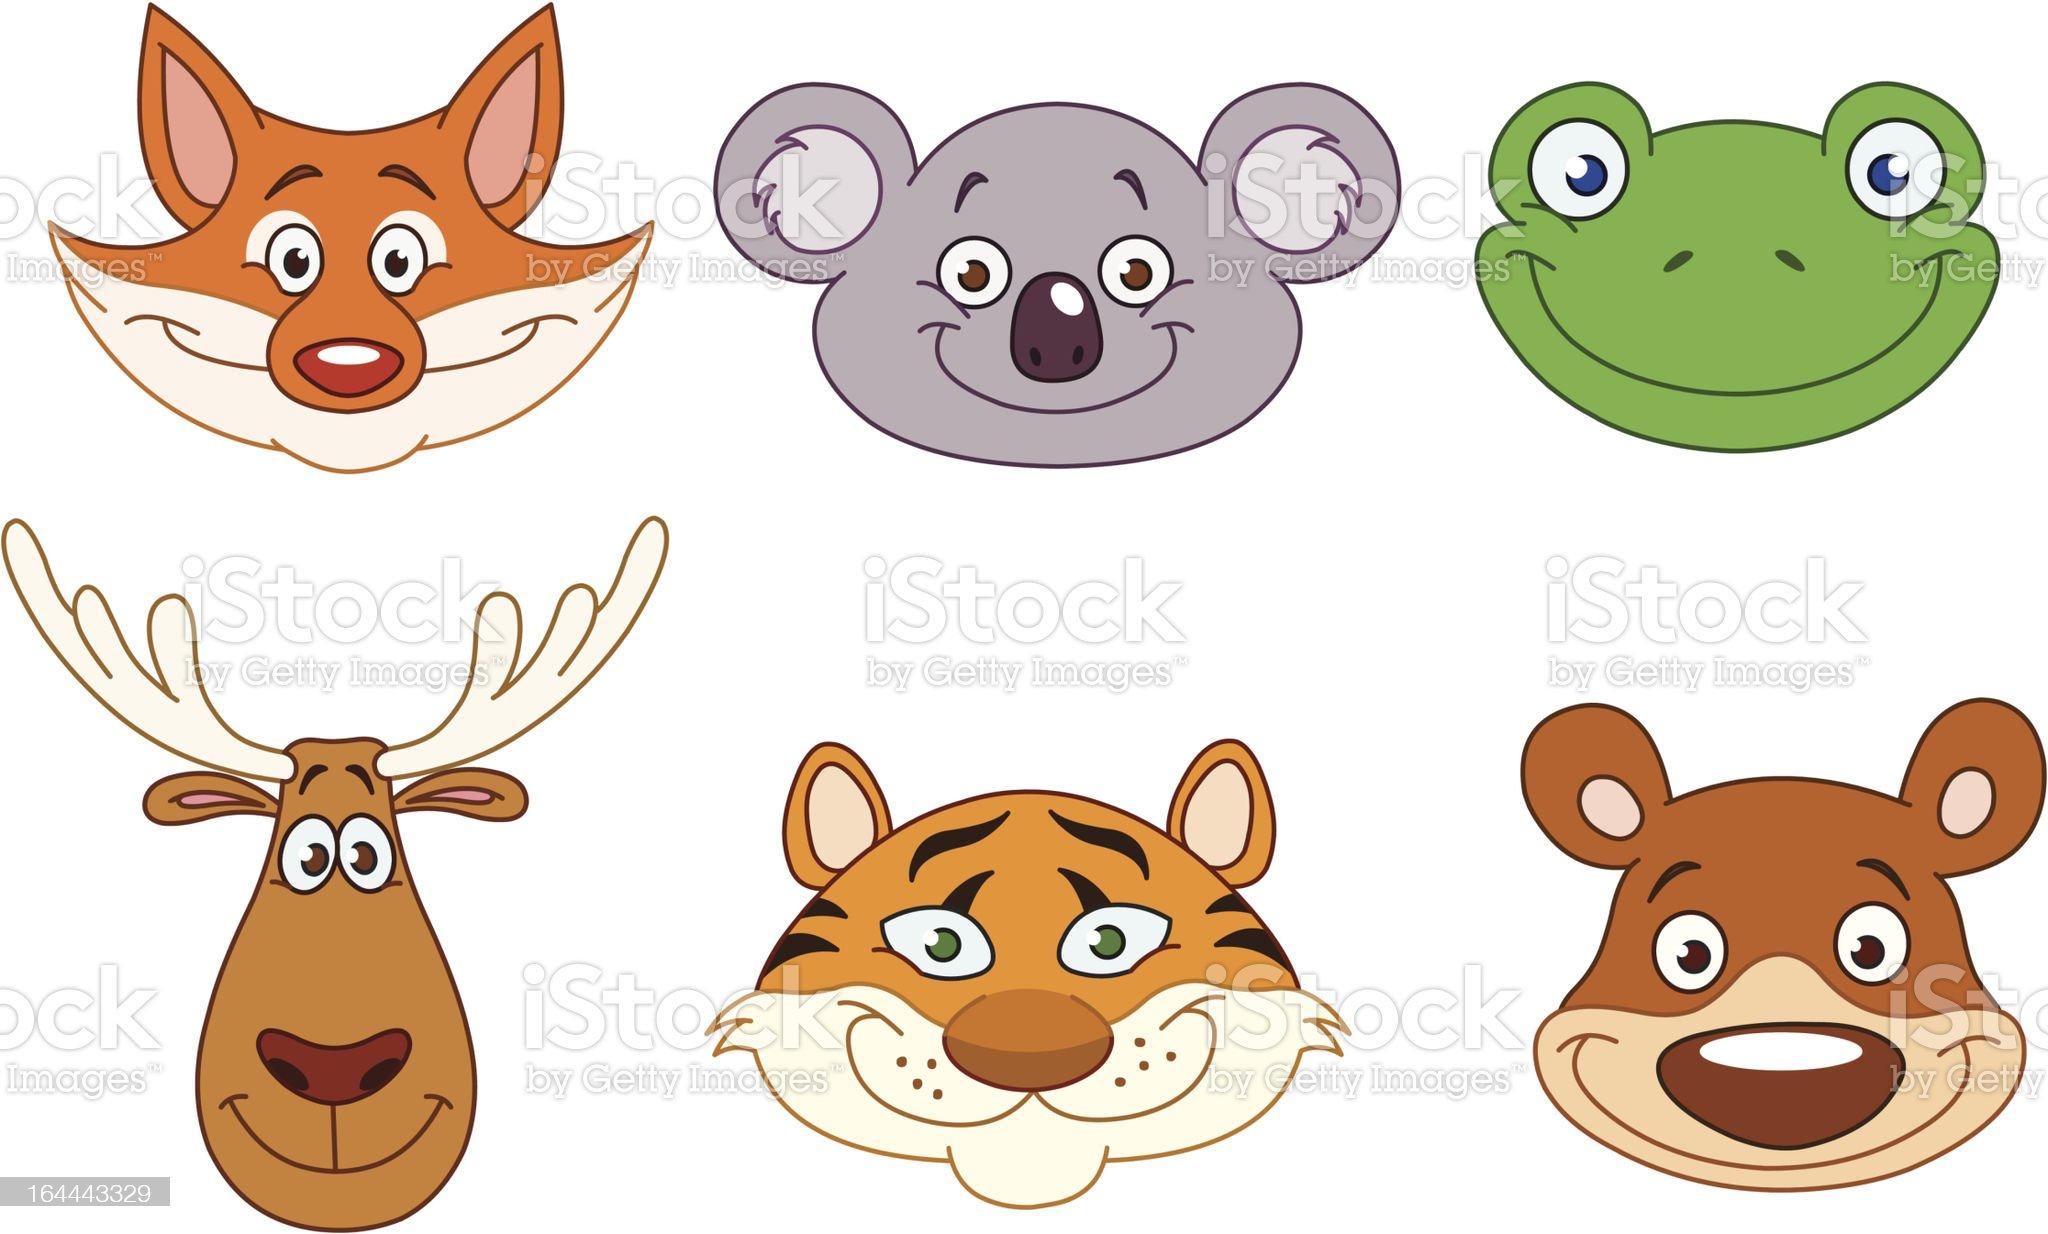 Animal heads 3 royalty-free stock vector art